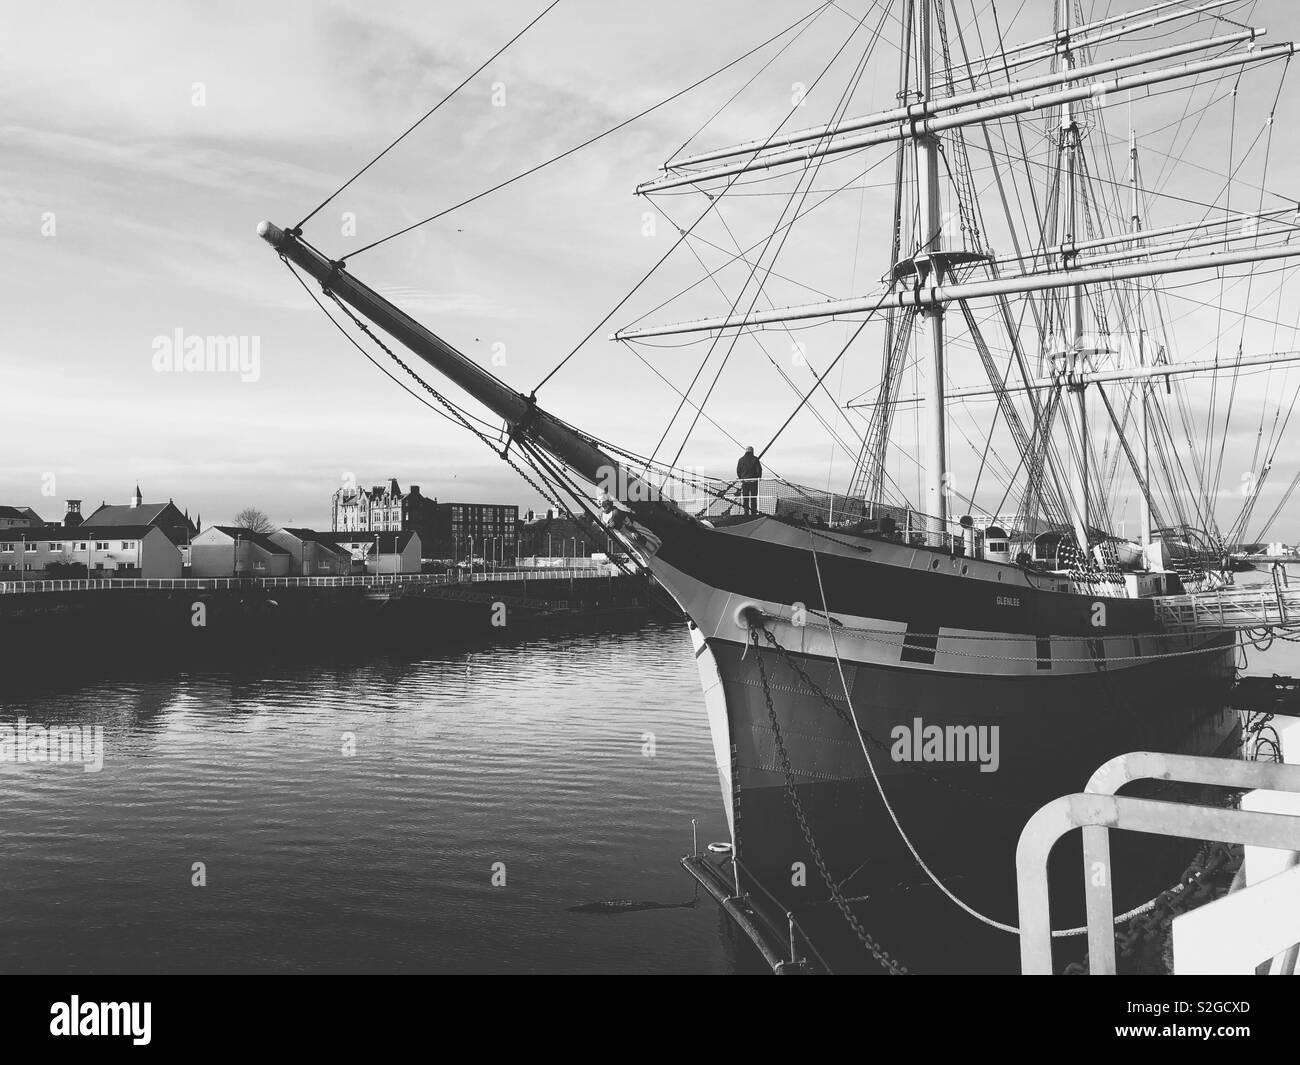 The Glenlee. Tall ship. Glasgow. Scotland. UK. - Stock Image